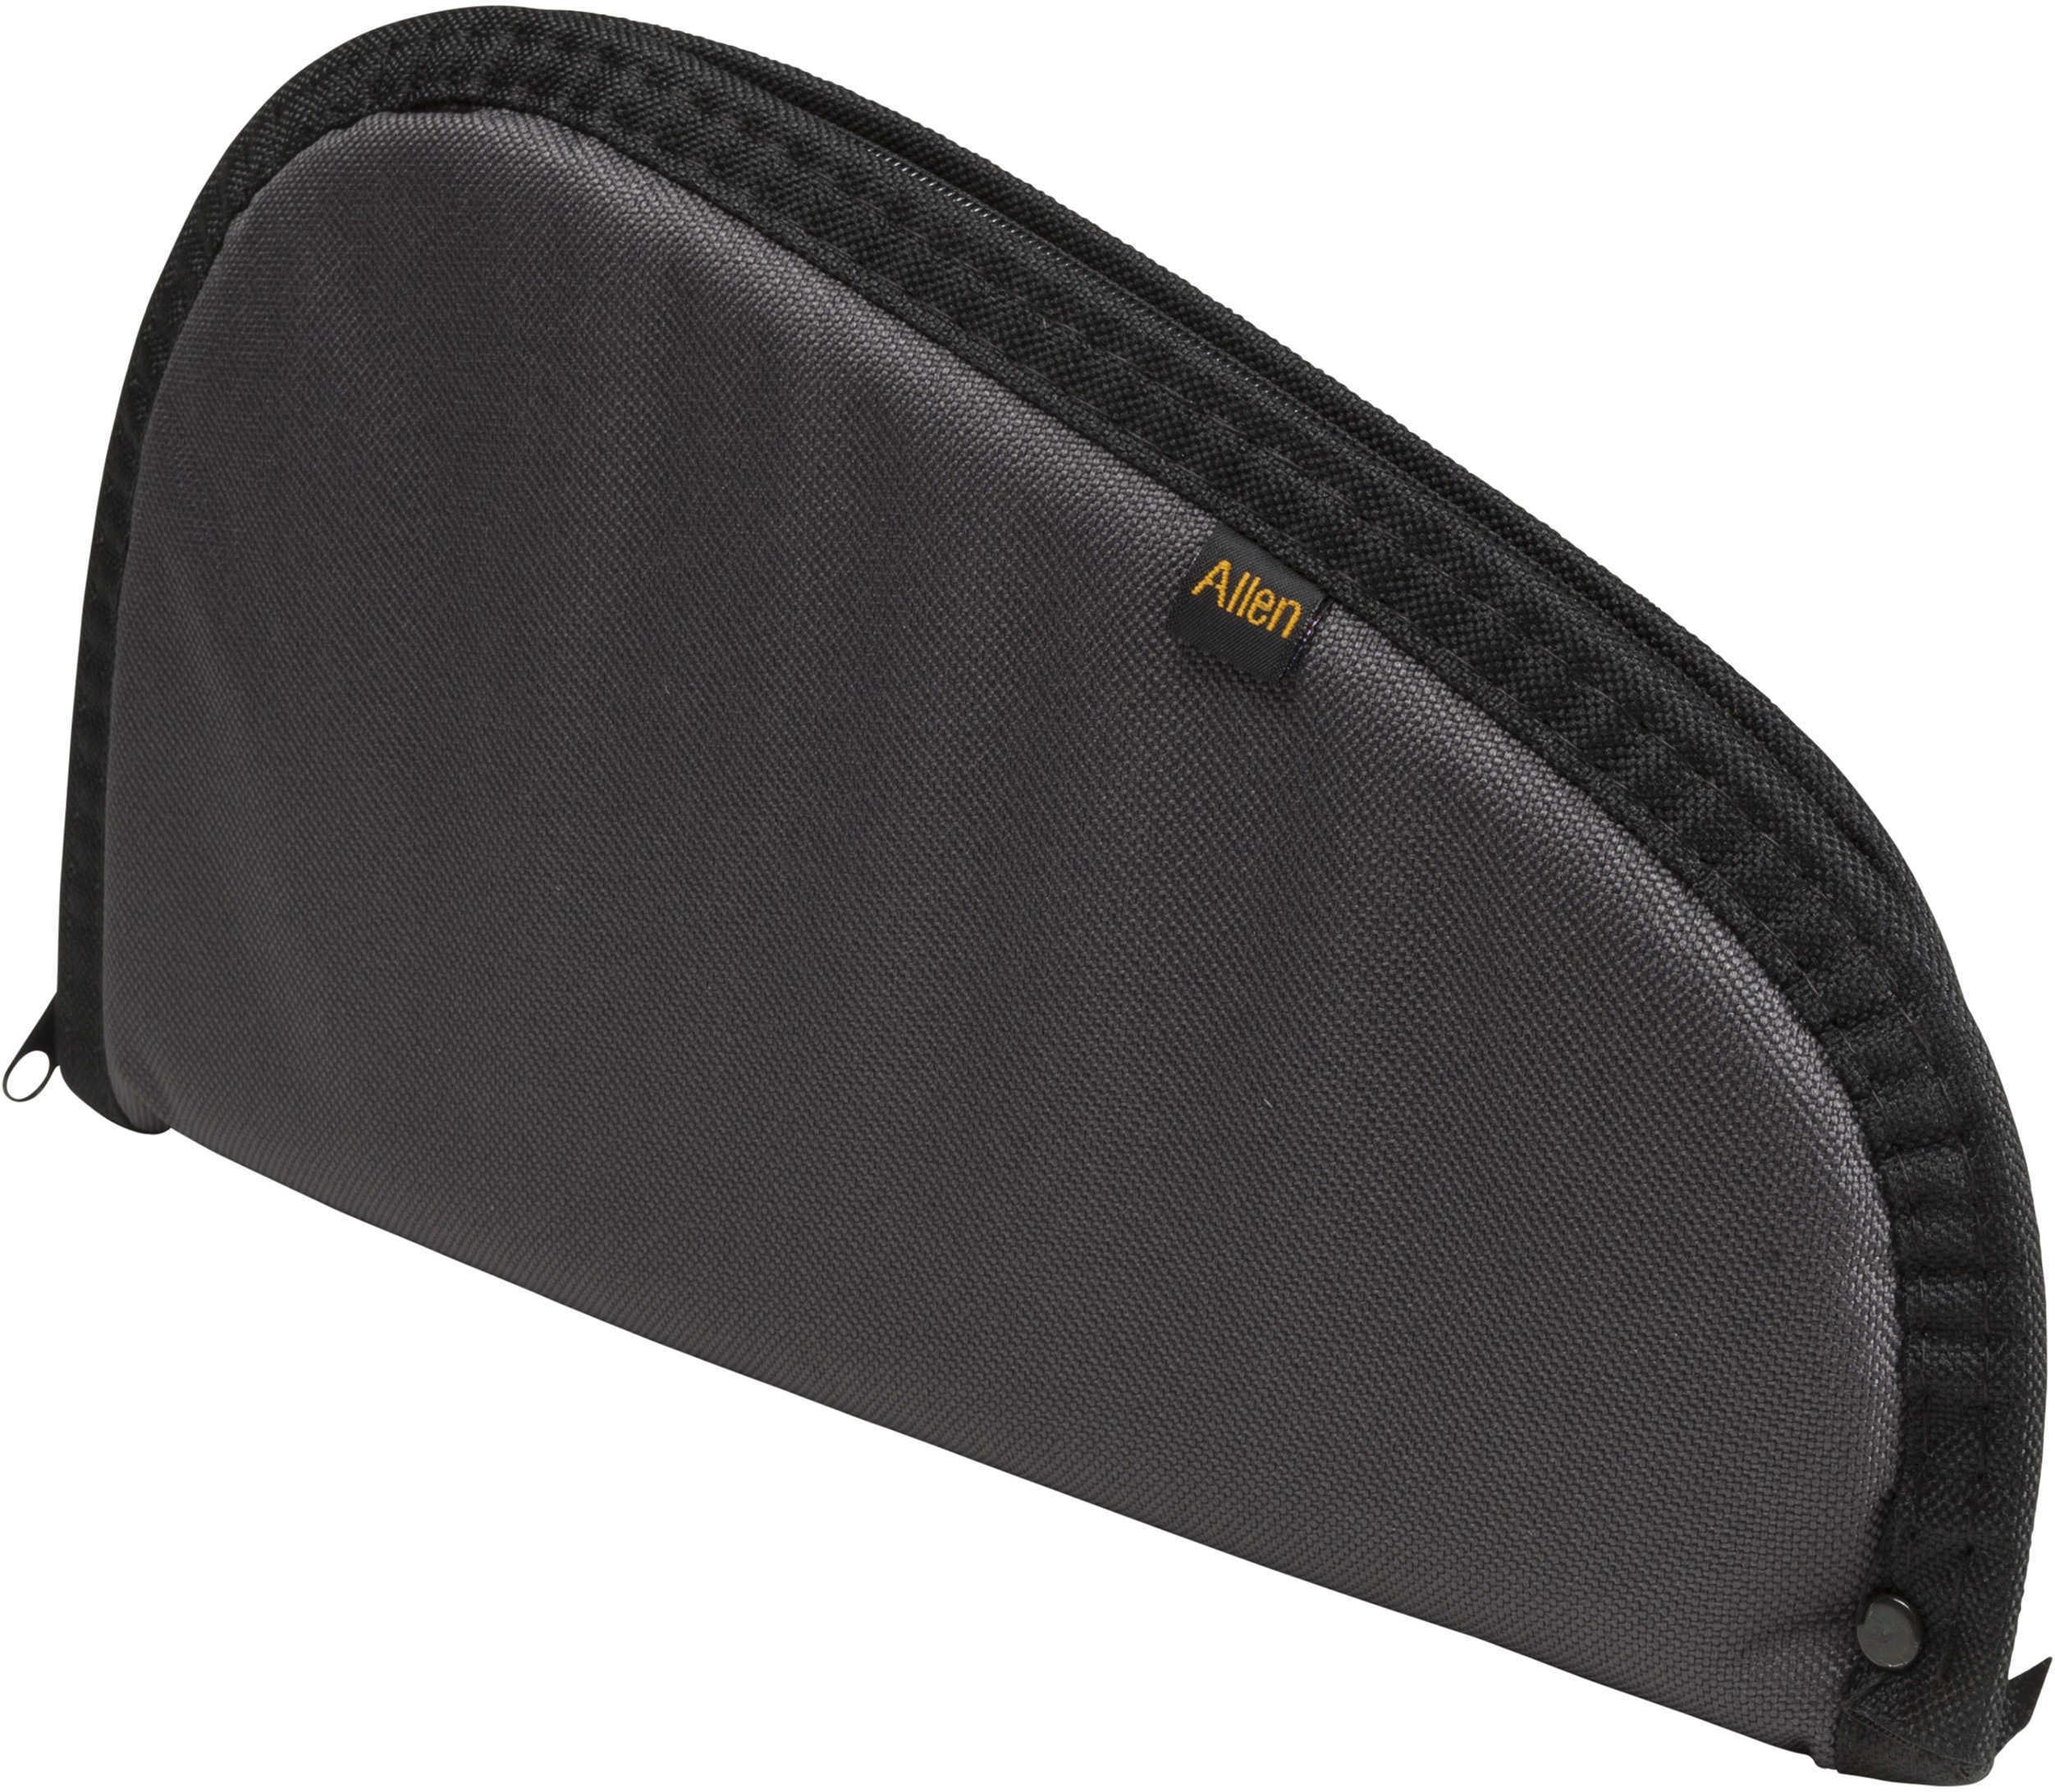 "Allen Assorted Fabric Pistol Rugs 8"" Assorted Fabric Pistol Case Md: 72-8"